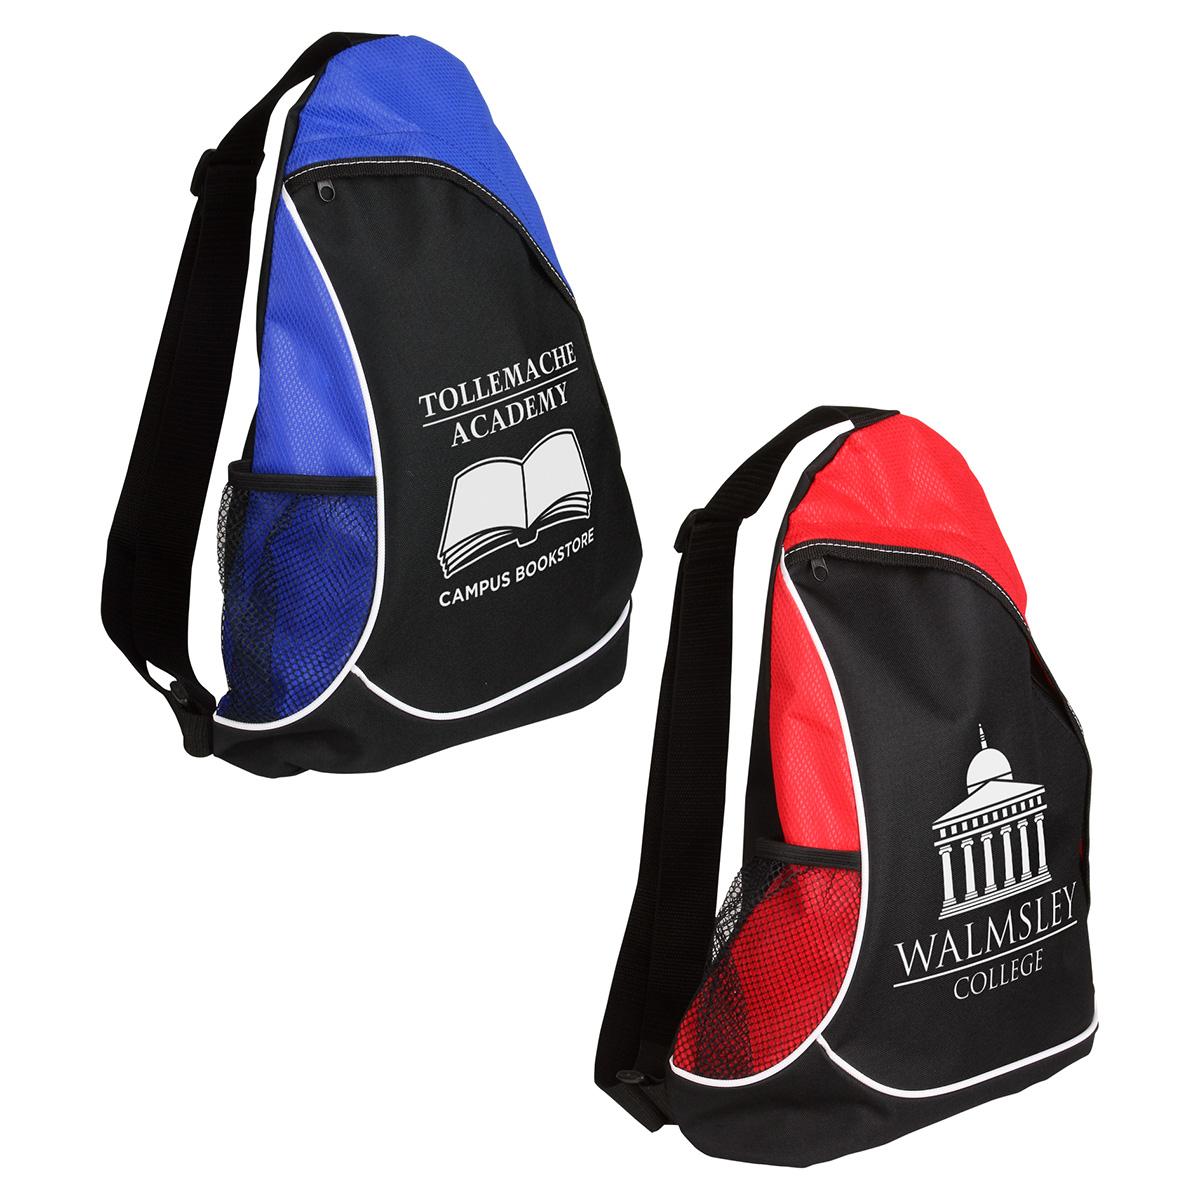 Natural Curve Sling Backpack, WBA-NC11 - 1 Colour Imprint